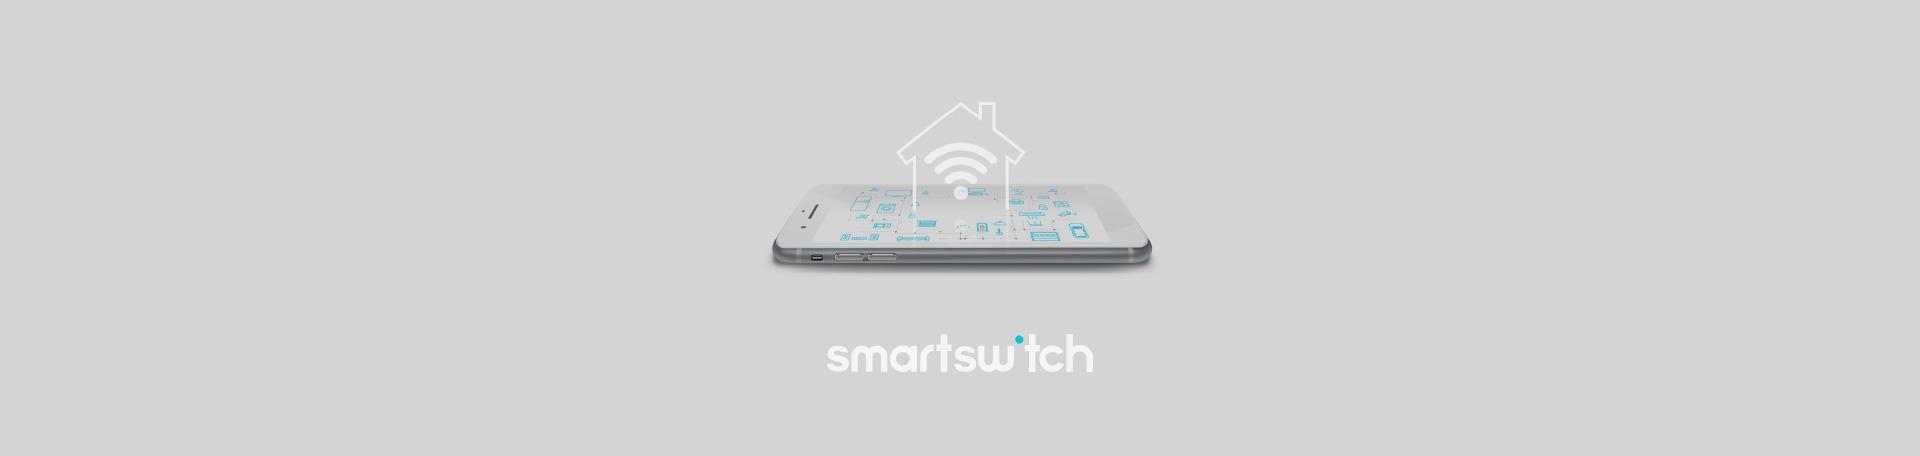 Smart-Switch-01